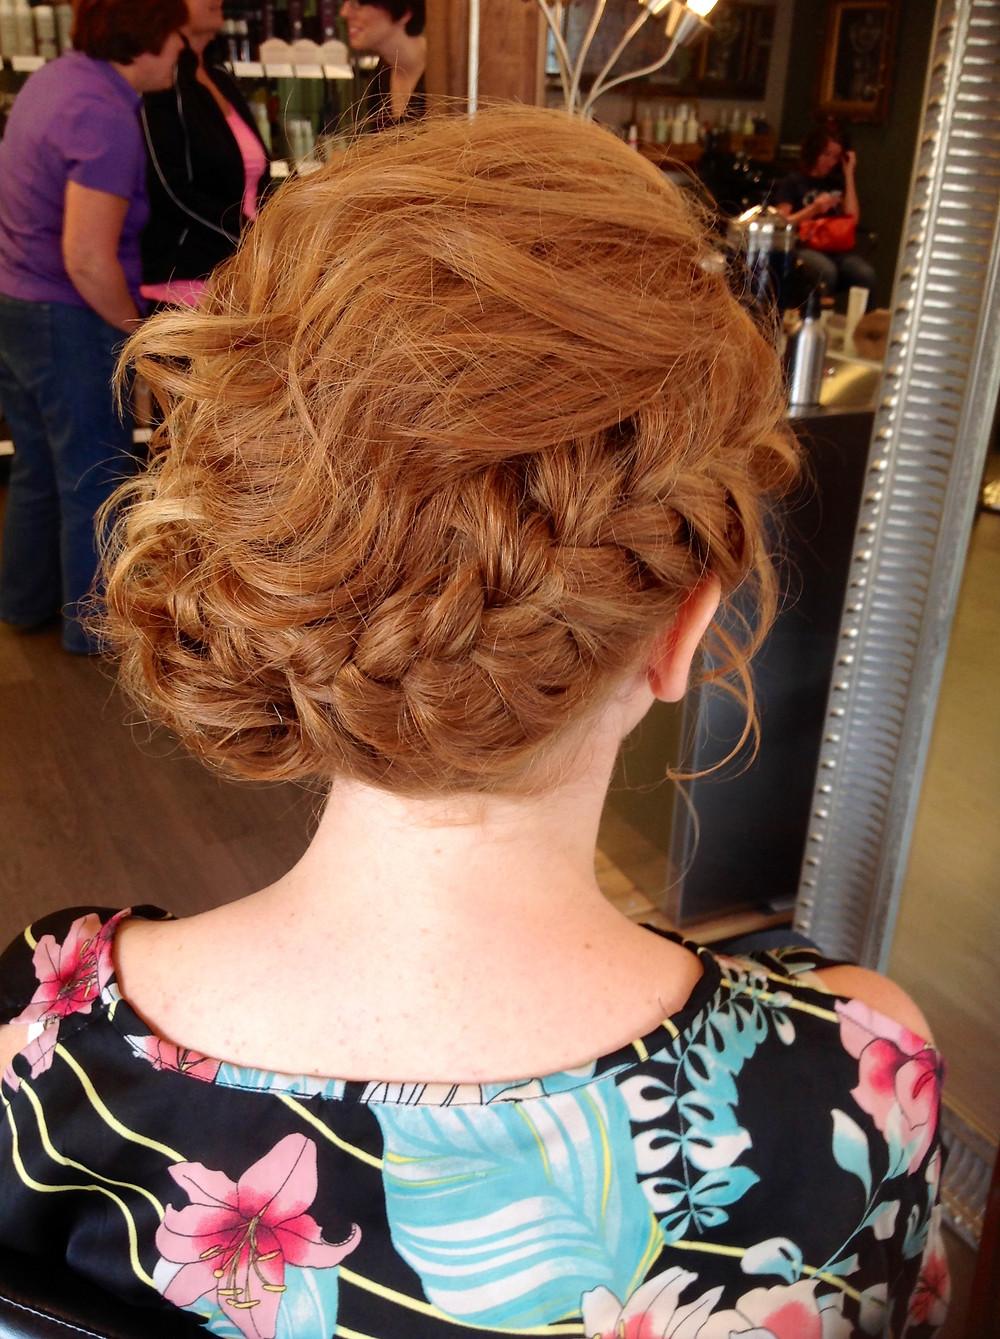 Hair & Makeup by Sara K | Braided bridal updo